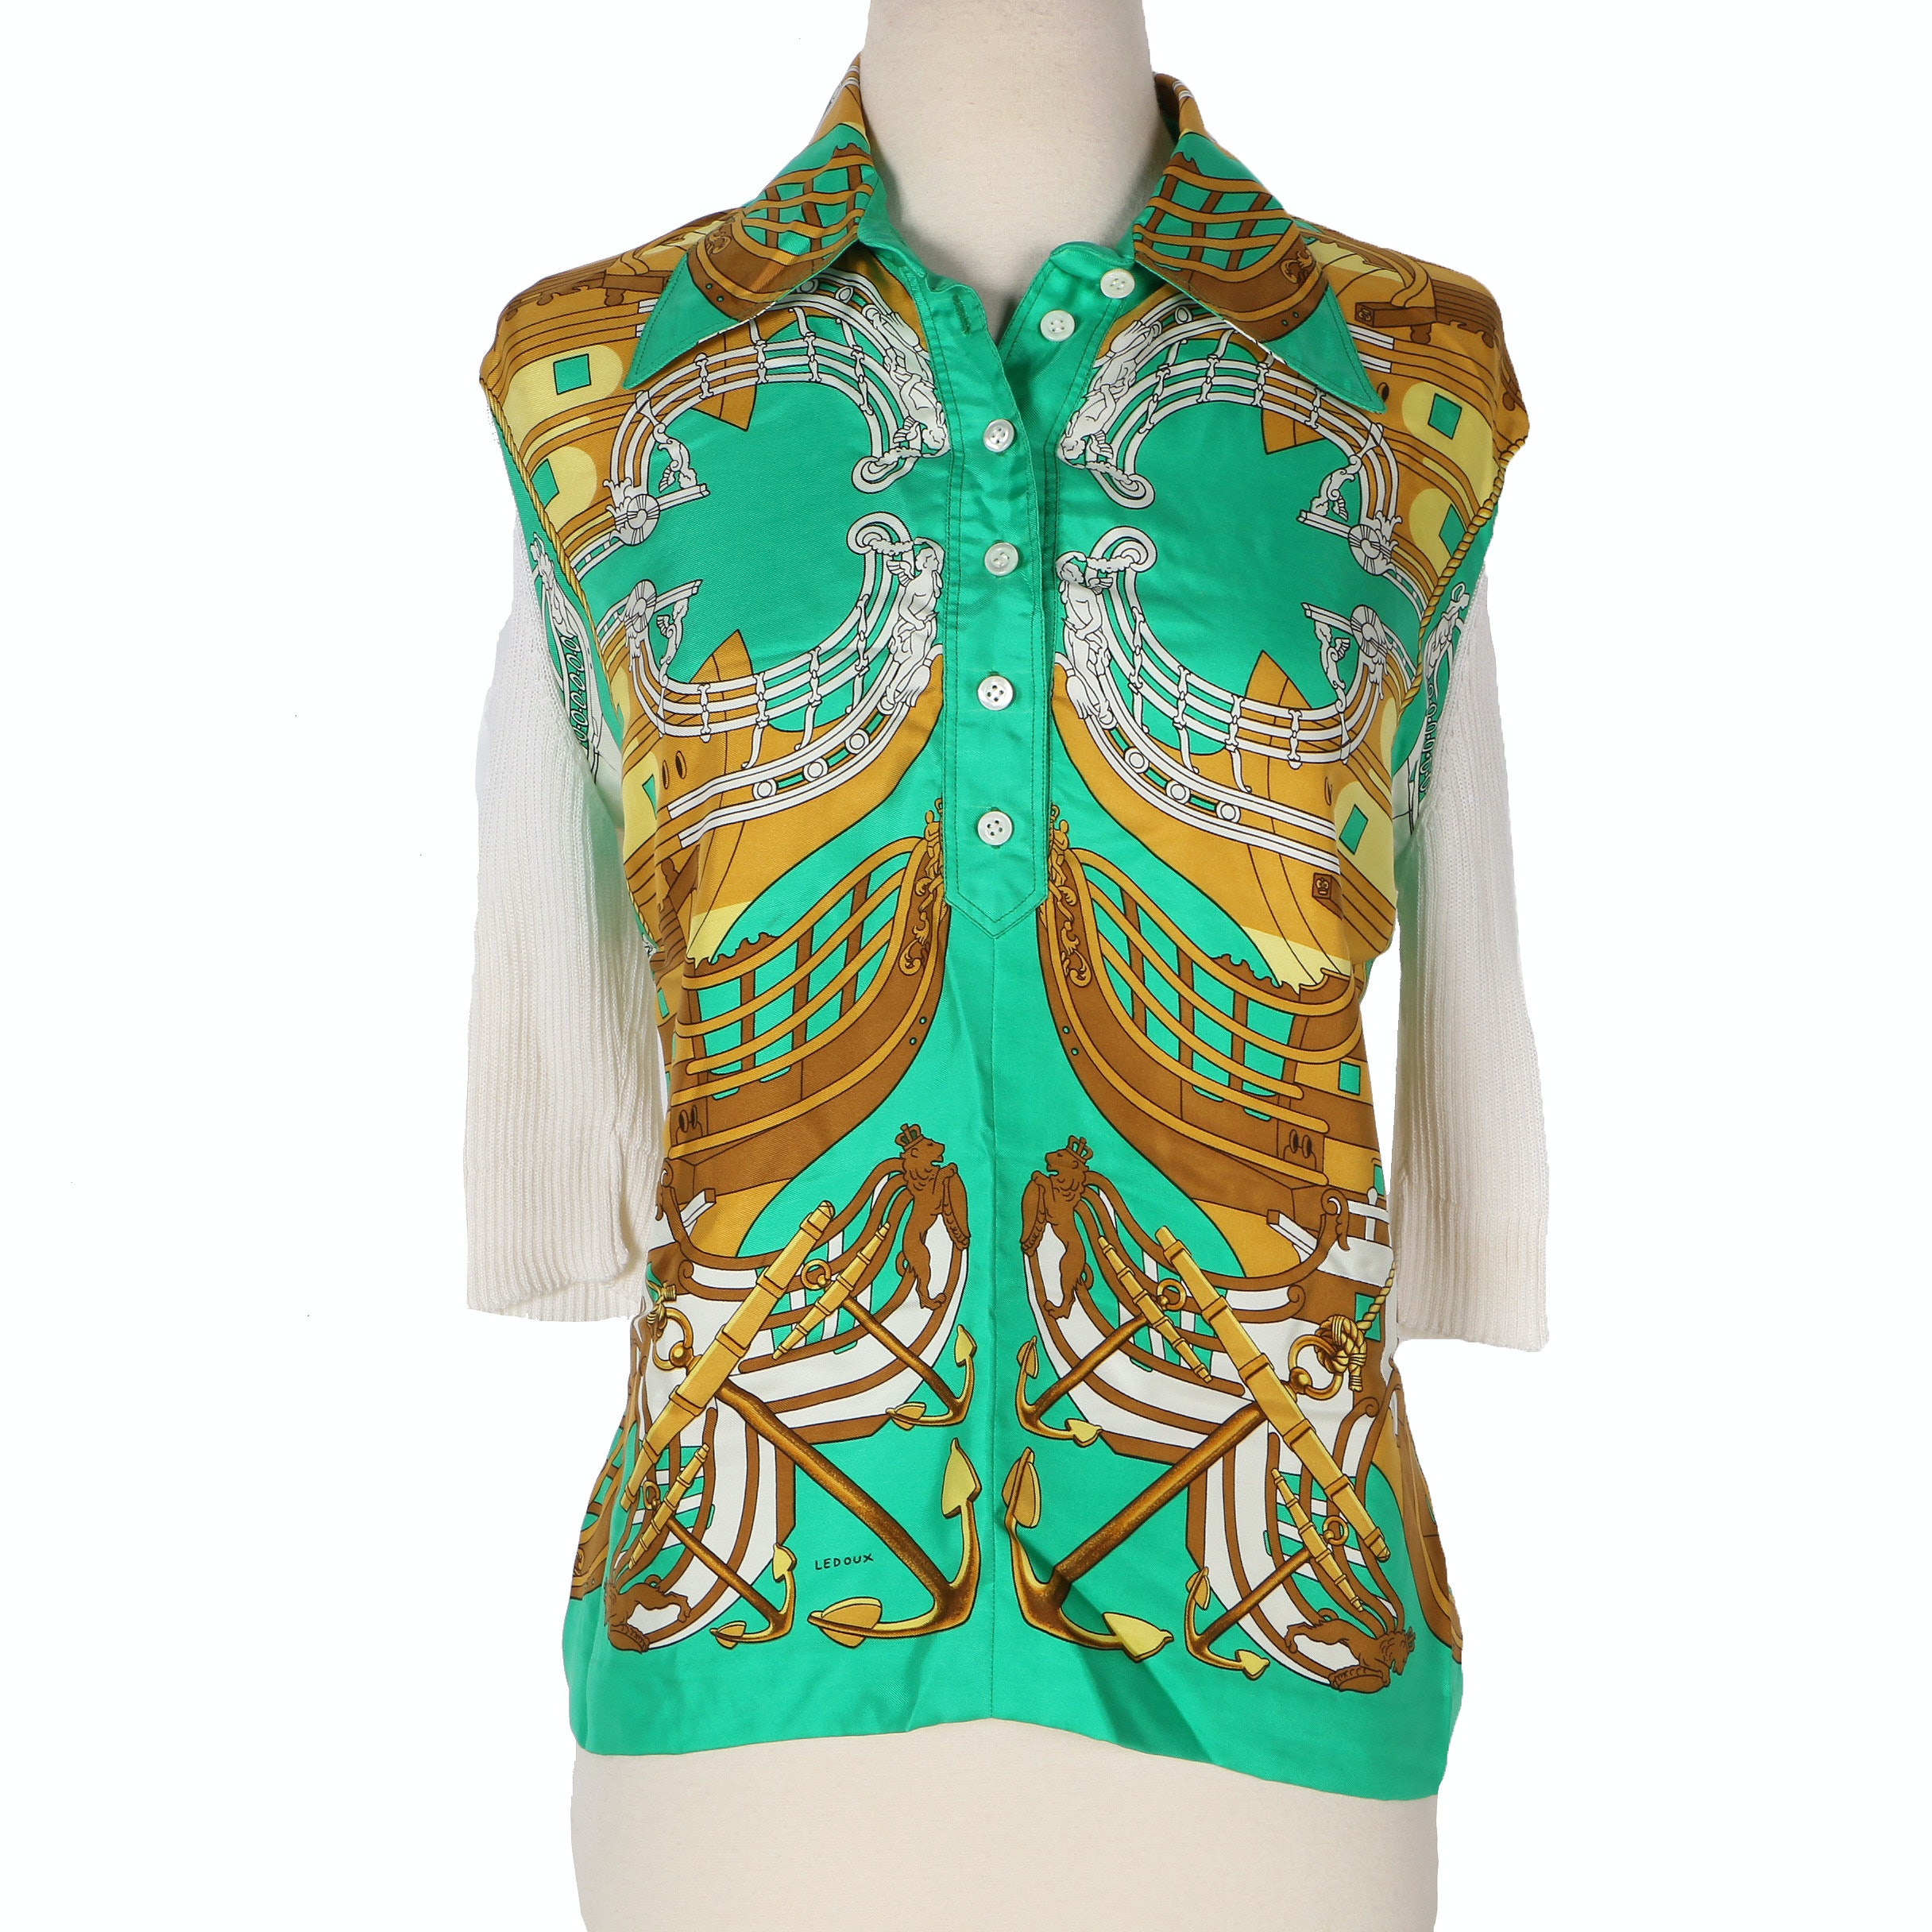 Vintage Hermès Shirt